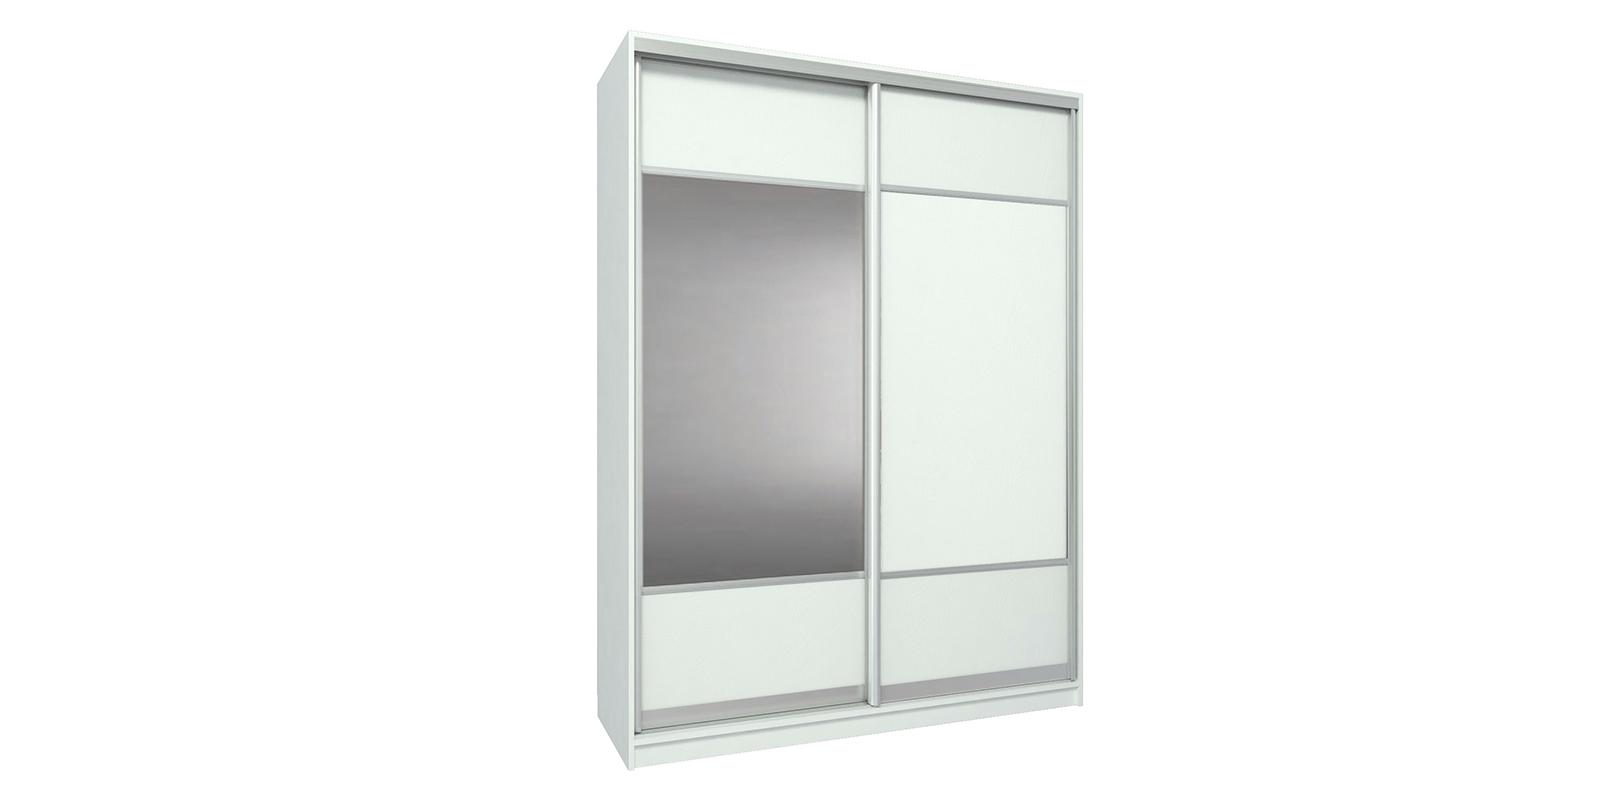 Шкаф-купе двухдверный Бостон 160 см (белый+зеркало)